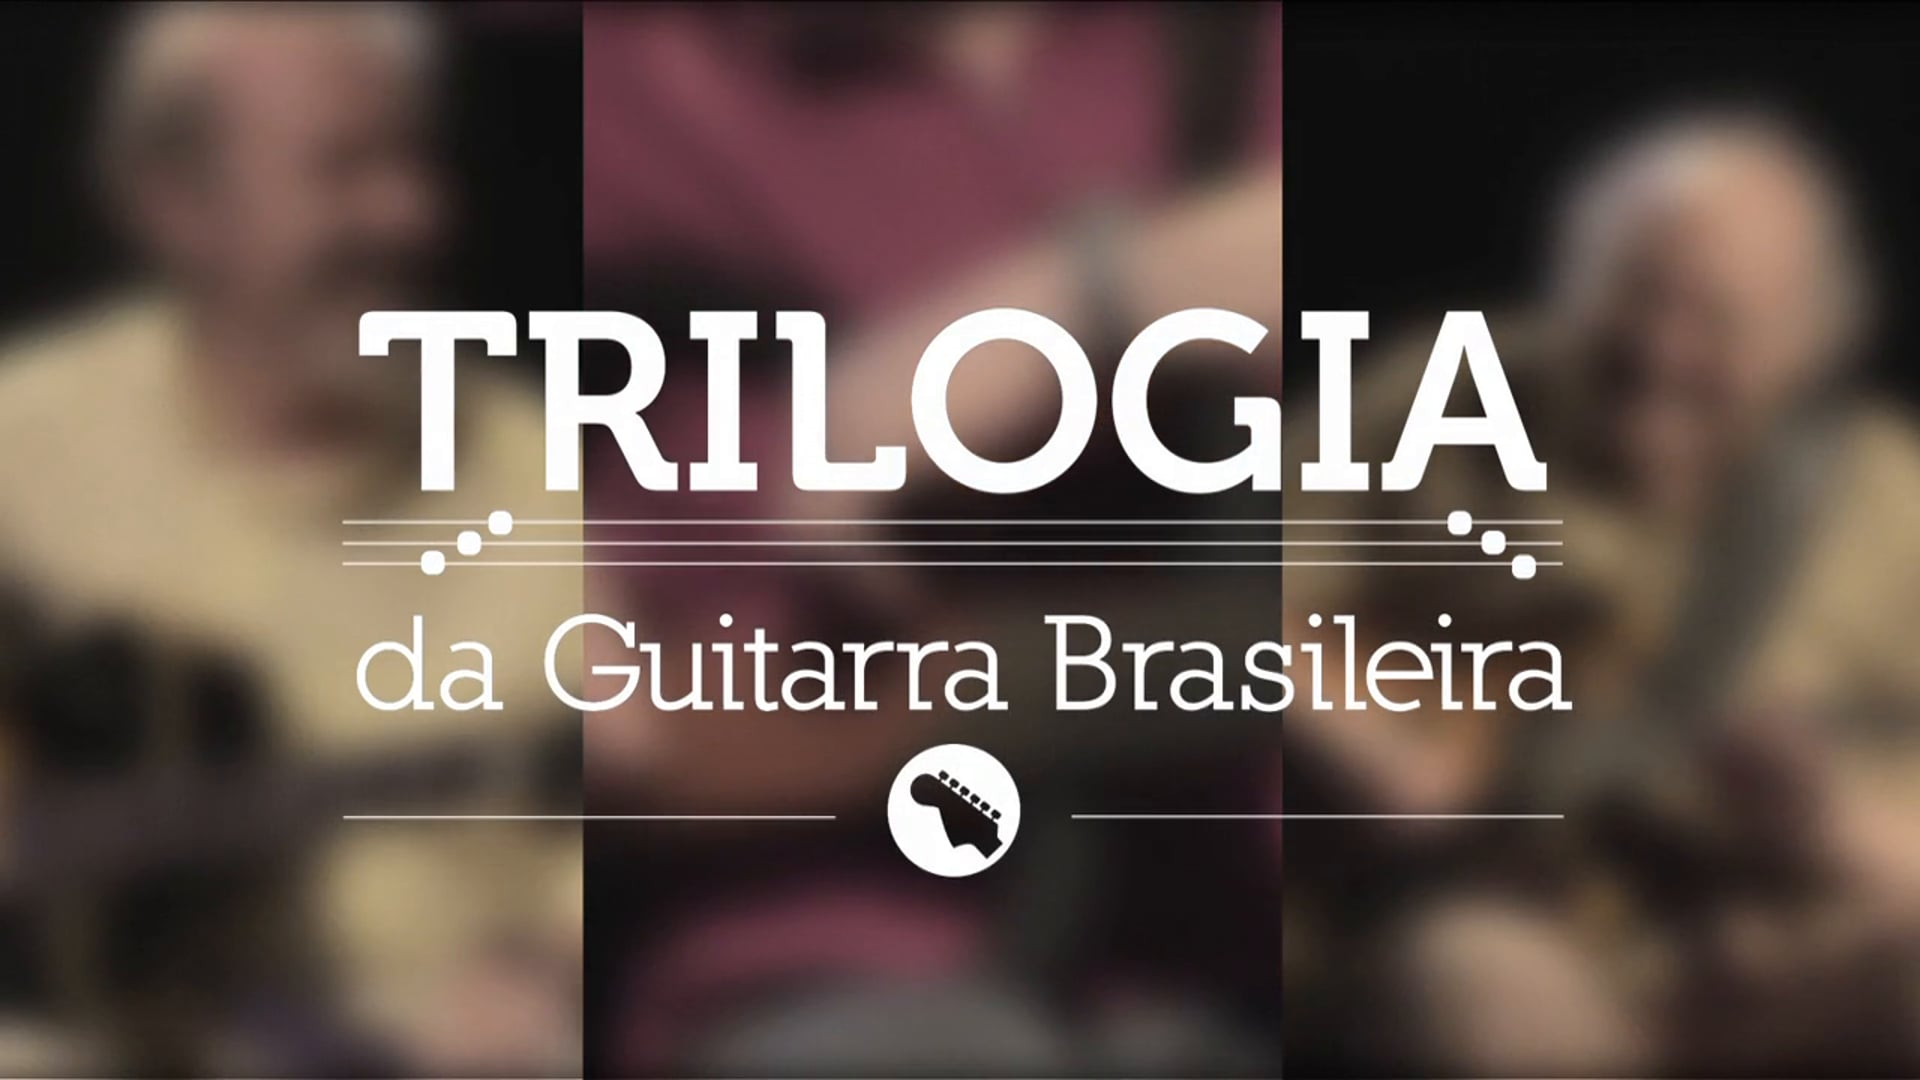 Trilogia da Guitarra Brasileira - SESCTV